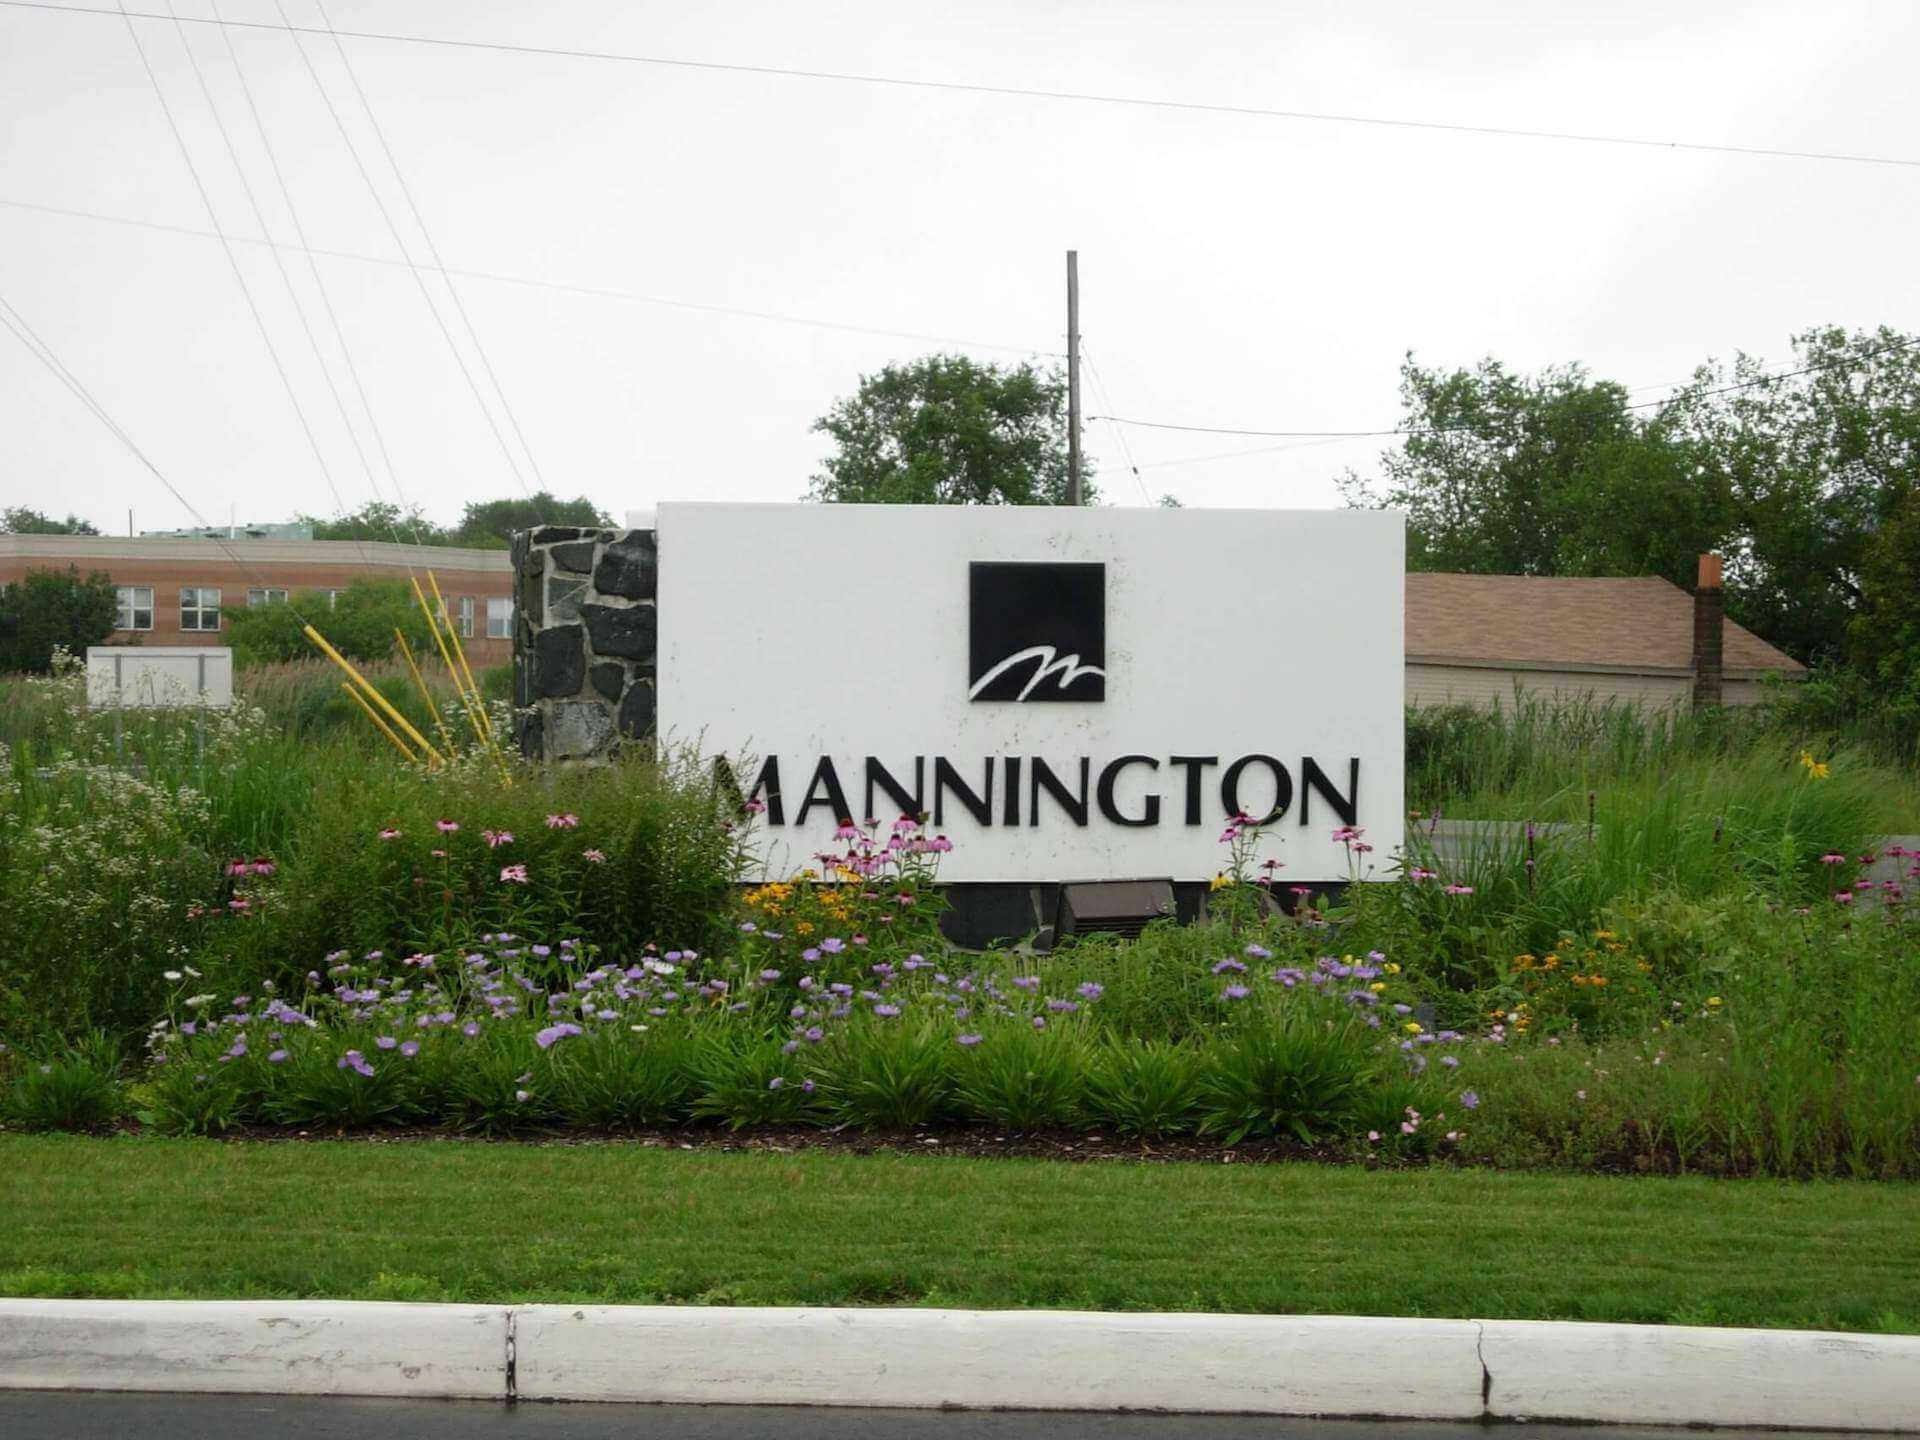 mannington mills sign next to street